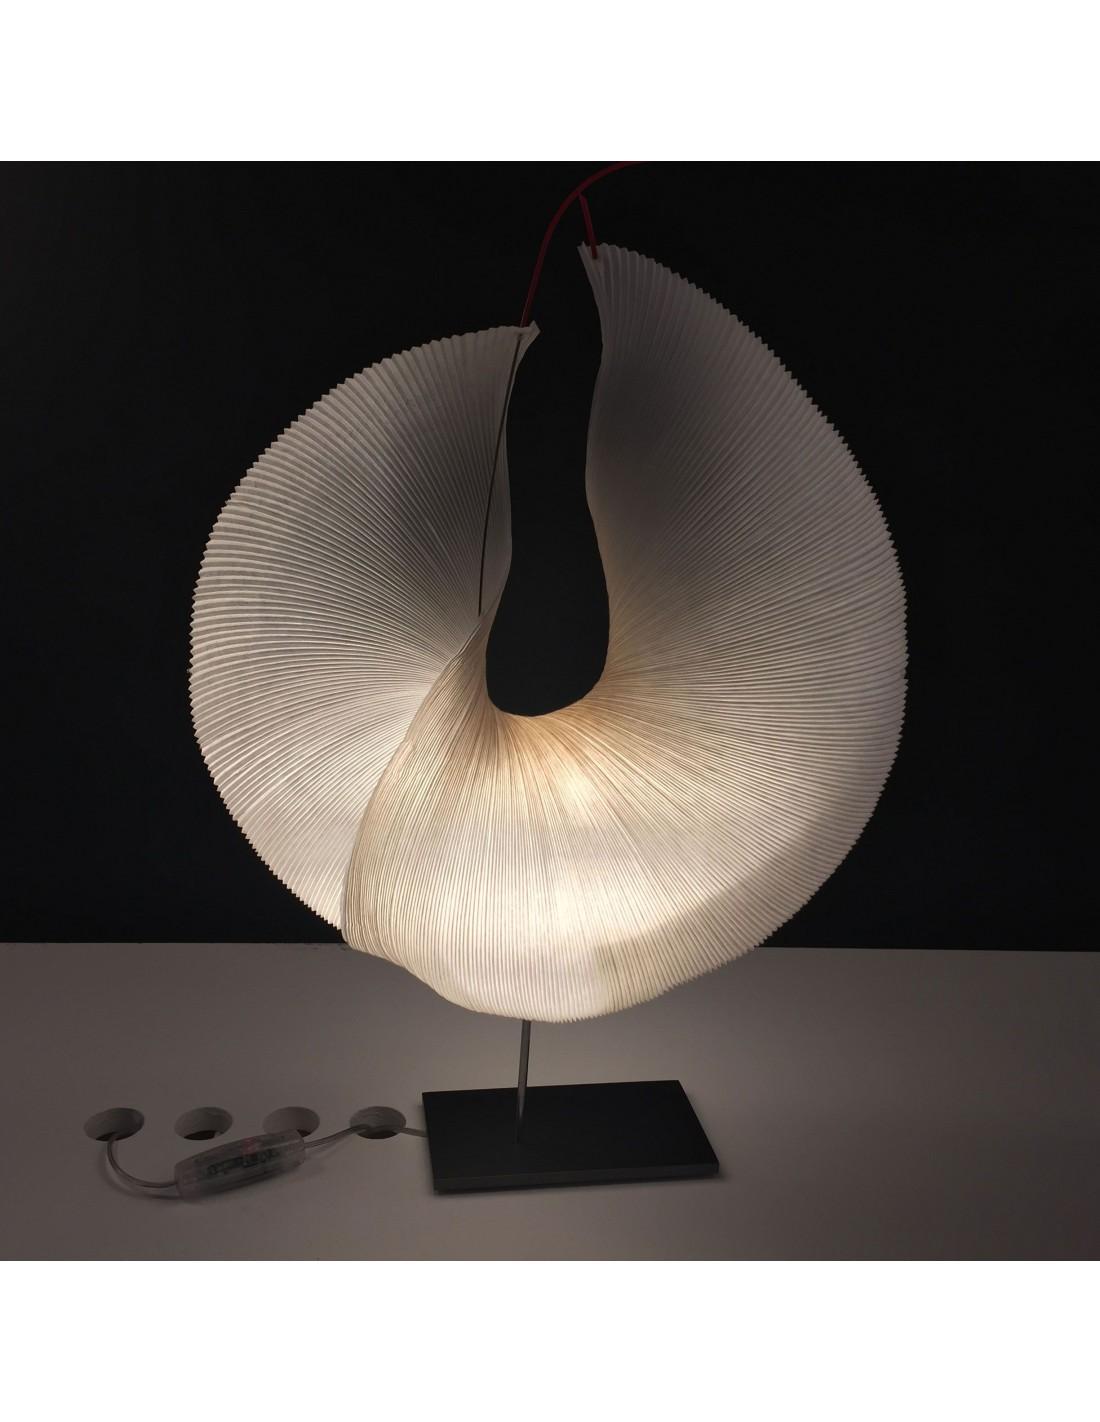 valente design luminaires lampe a poser yoruba rose d tail. Black Bedroom Furniture Sets. Home Design Ideas